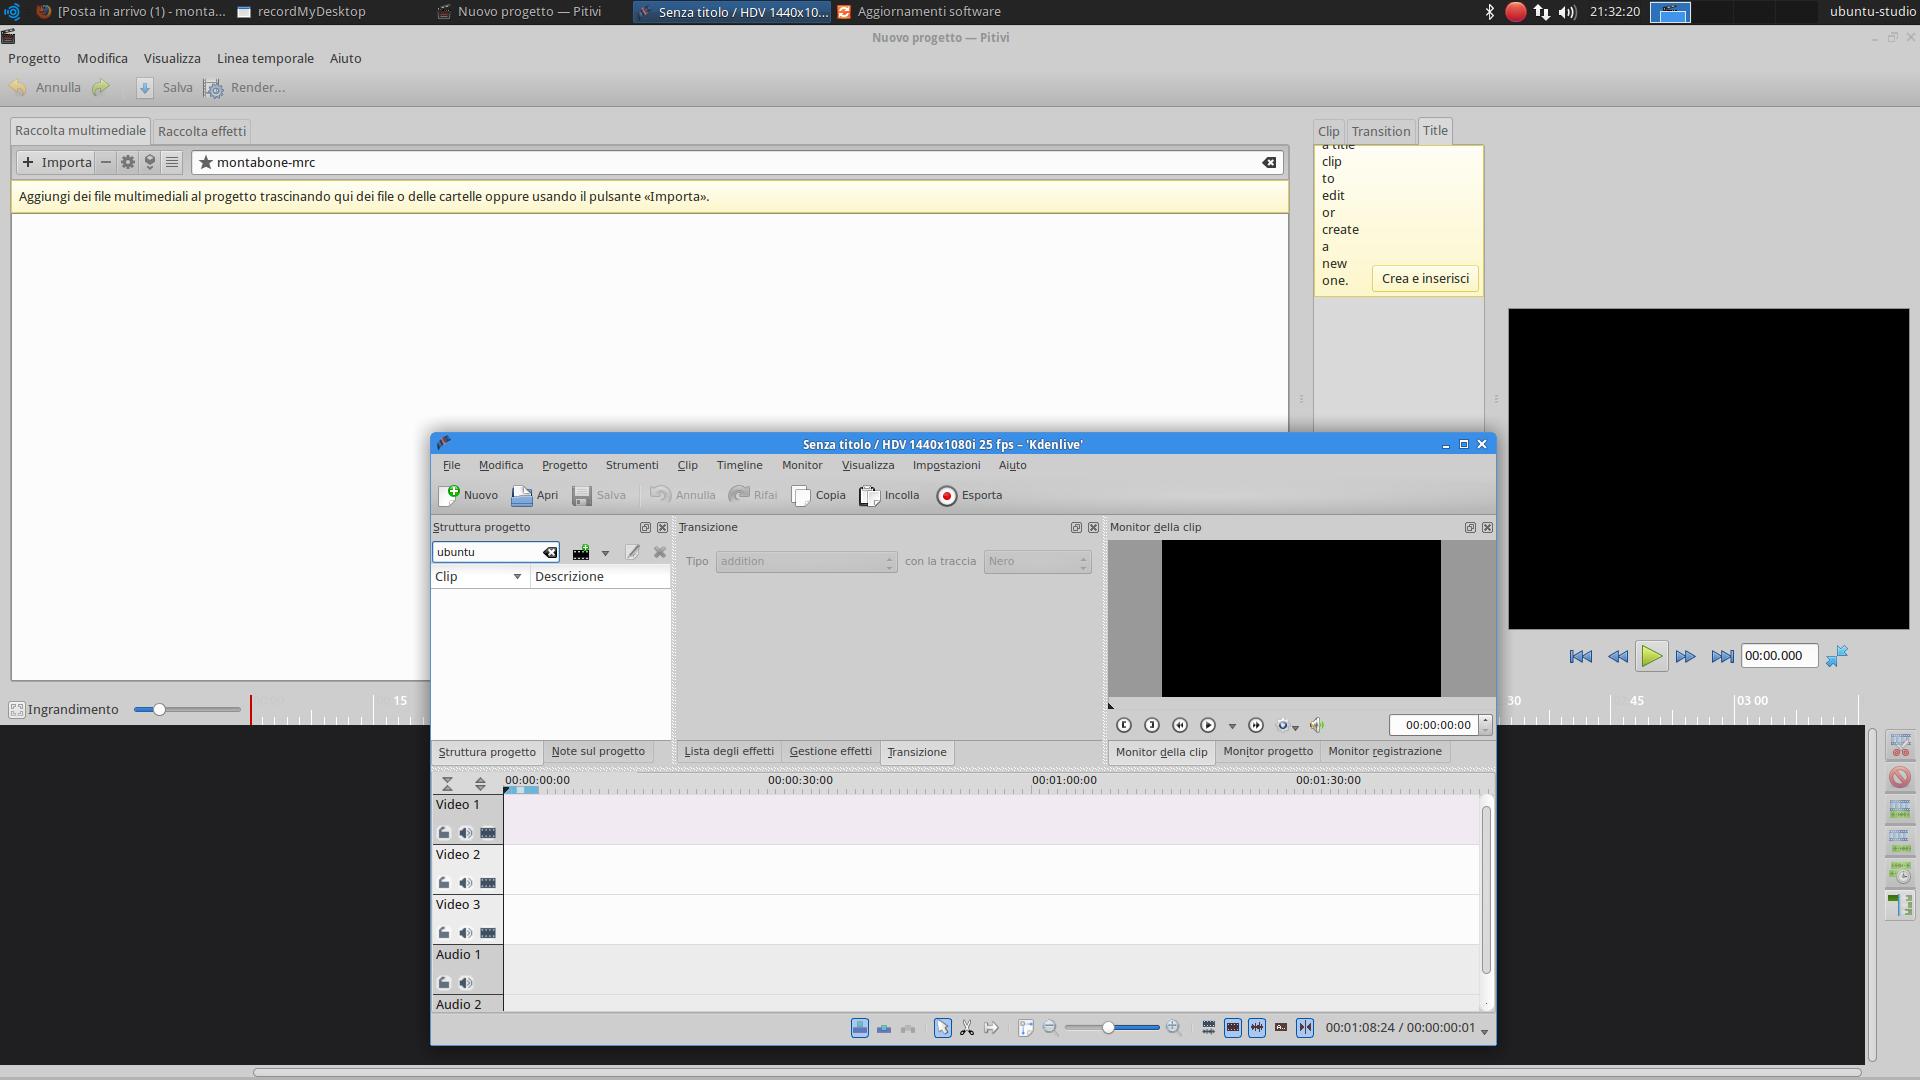 sites/default/files/scopri-ubuntu/ubuntustudio/video.png